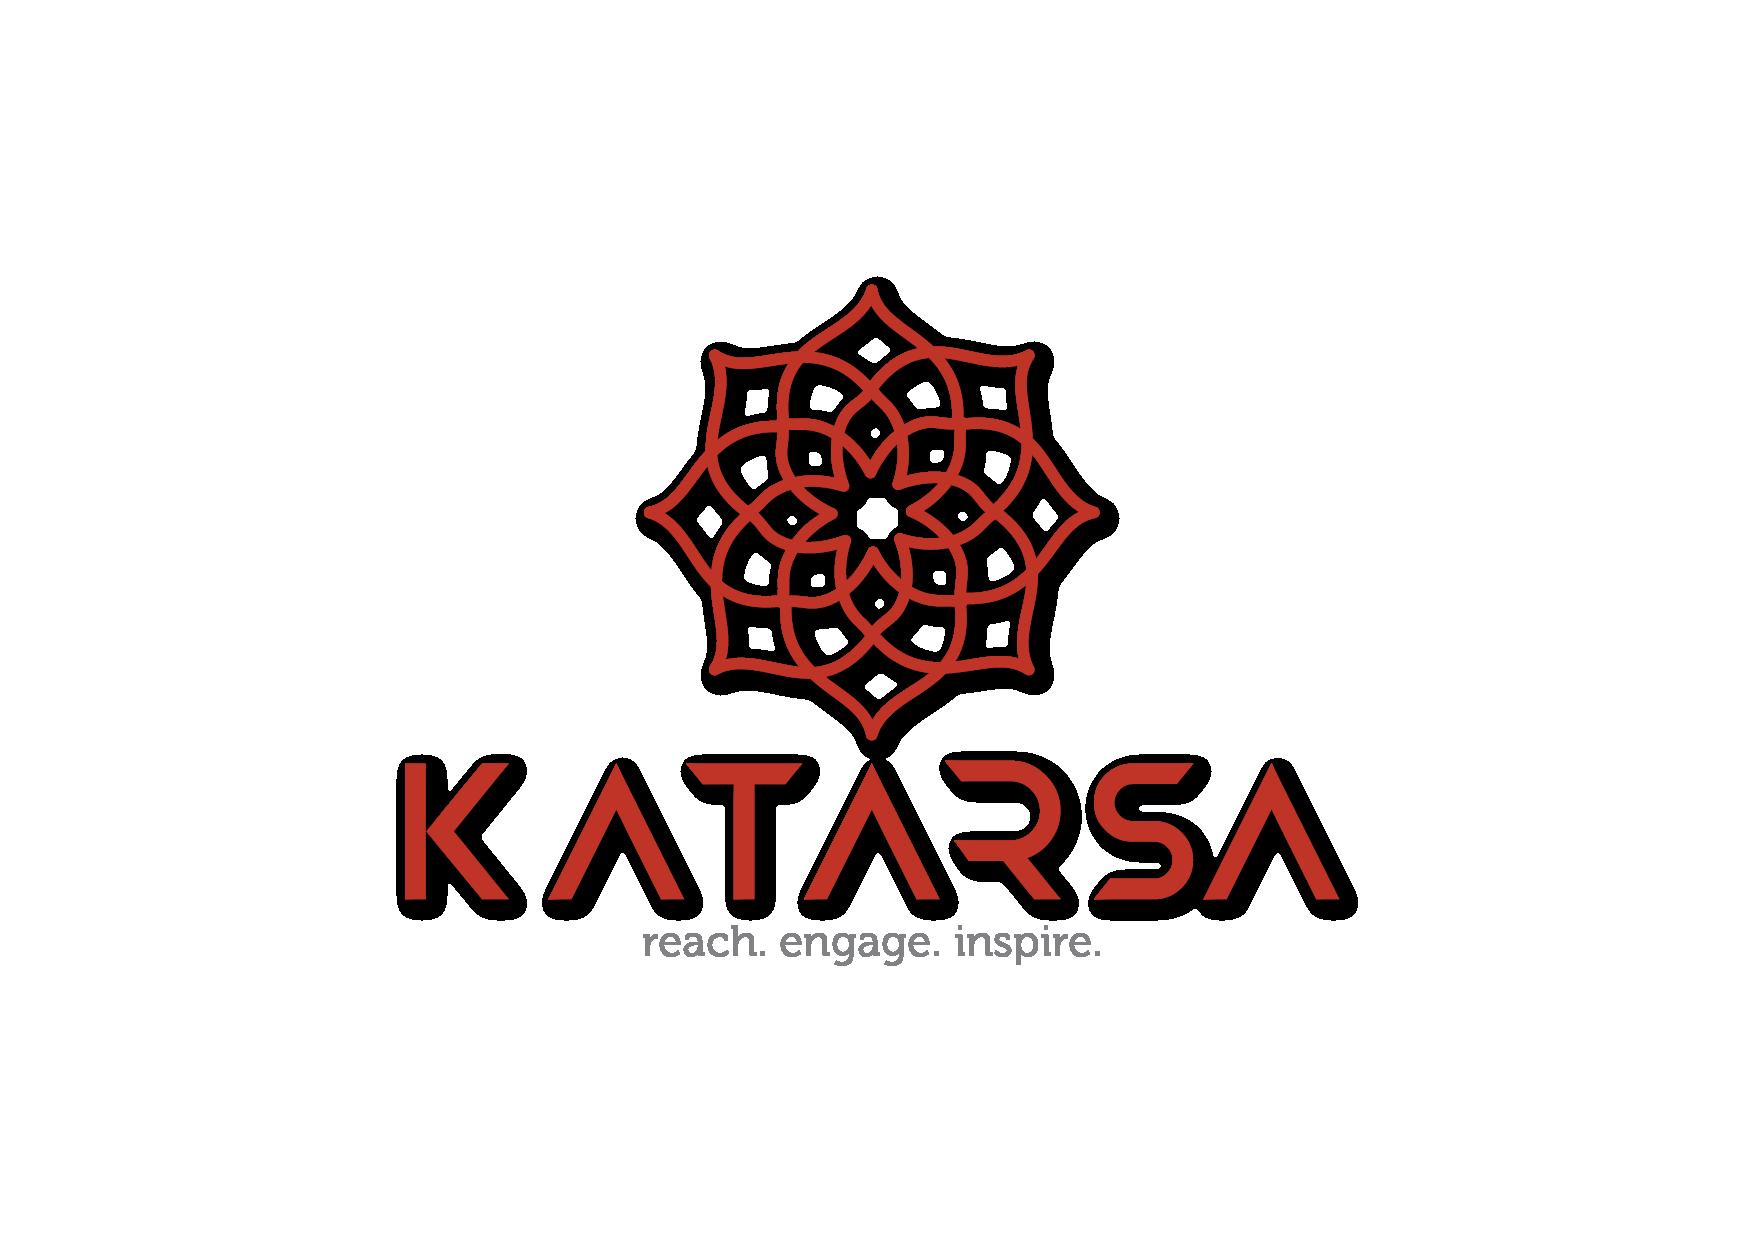 KATARSA